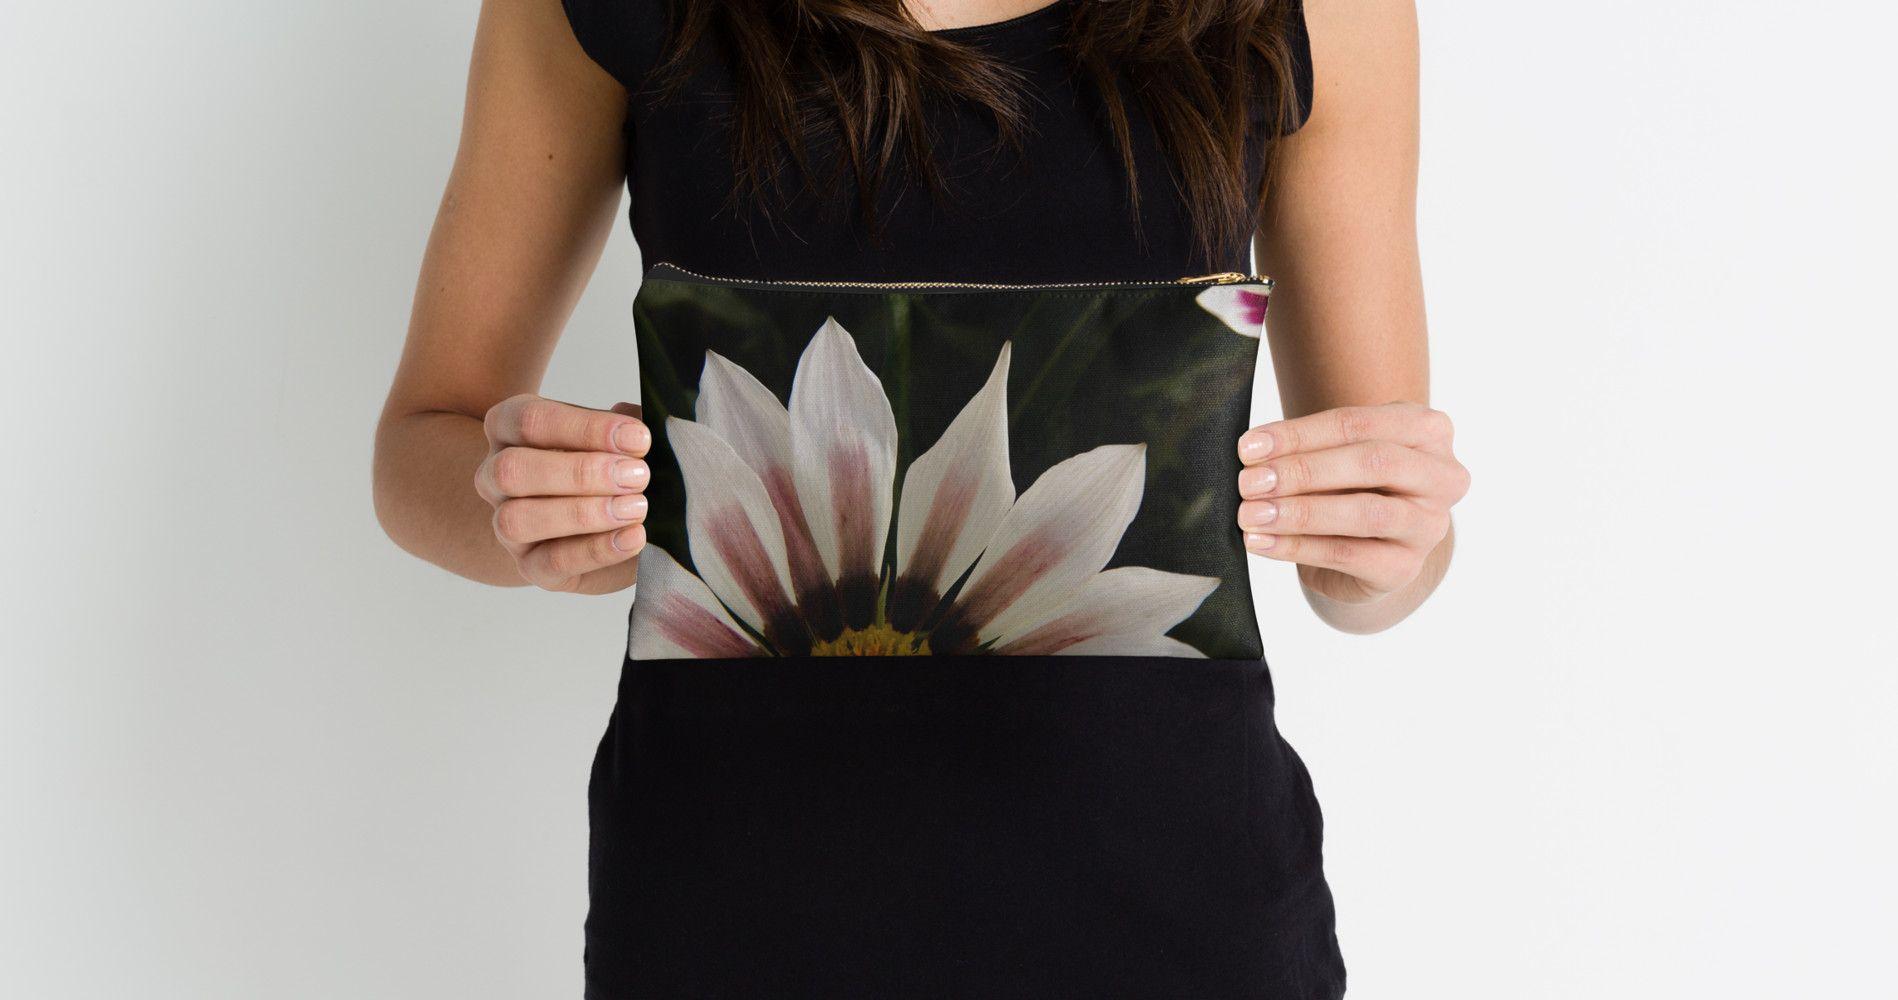 #flower #flowers #nature #petals #floral #daisies #plants #photography #pouch #pouches #studiopouches #gazania